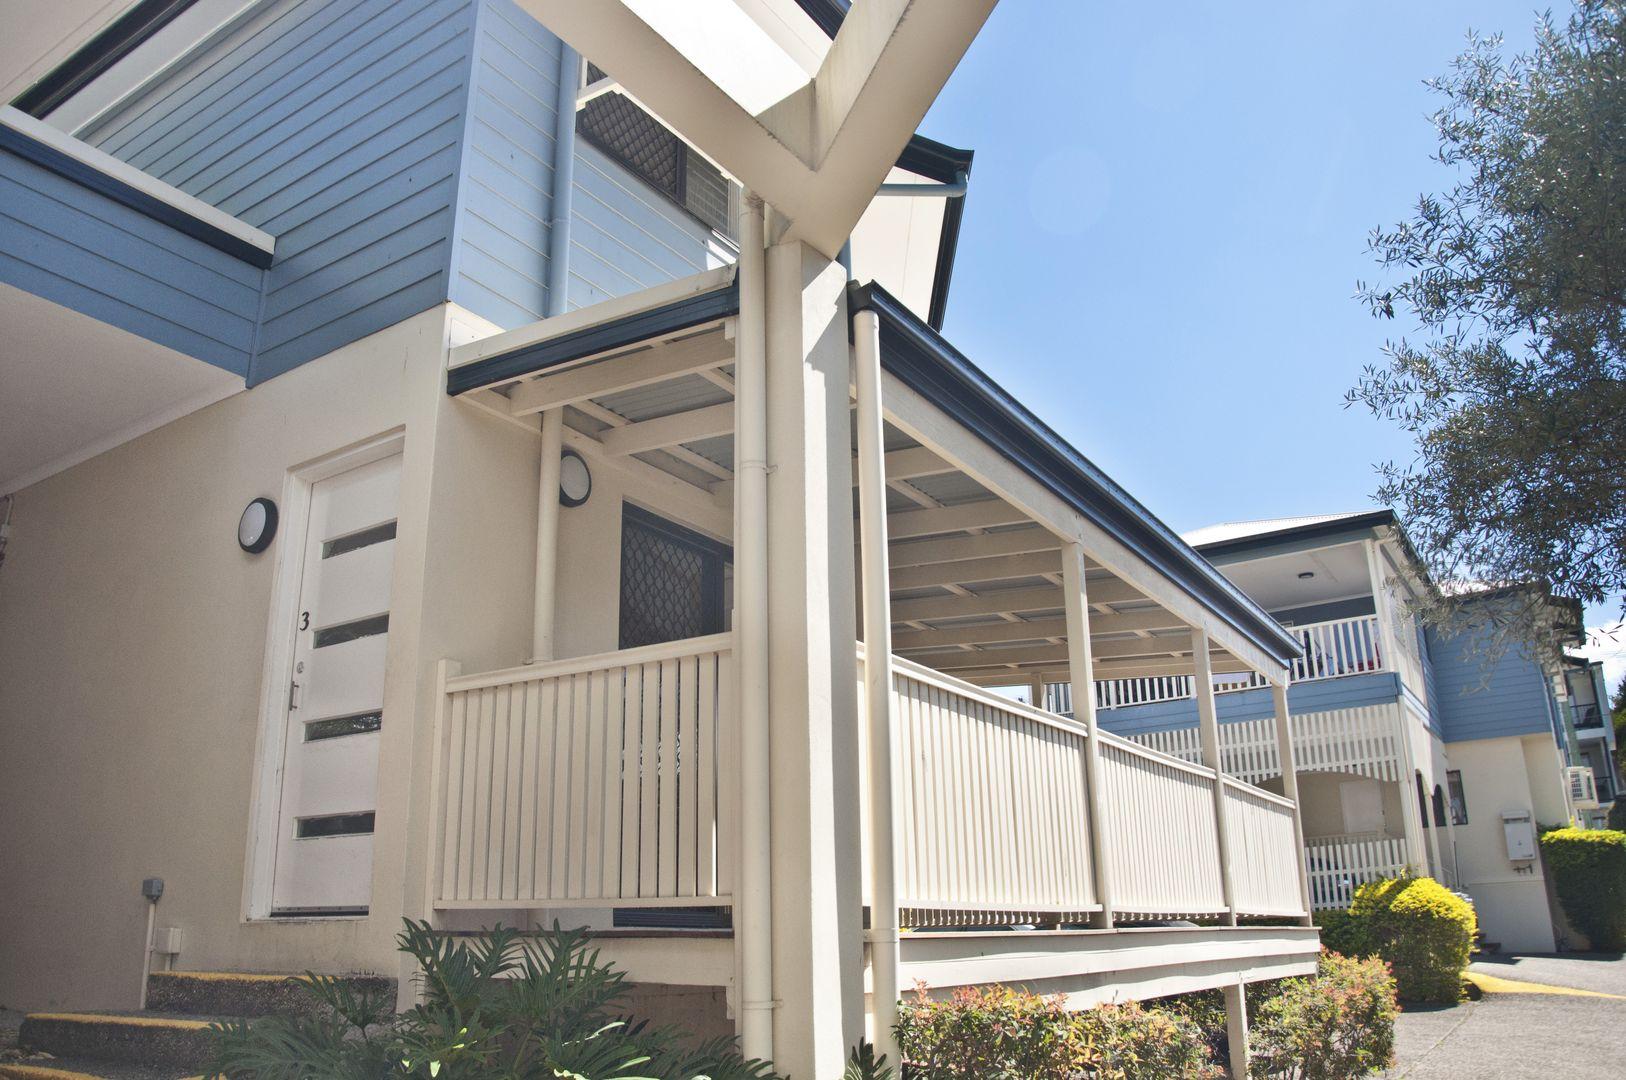 3/47 Terrace St, New Farm QLD 4005, Image 0